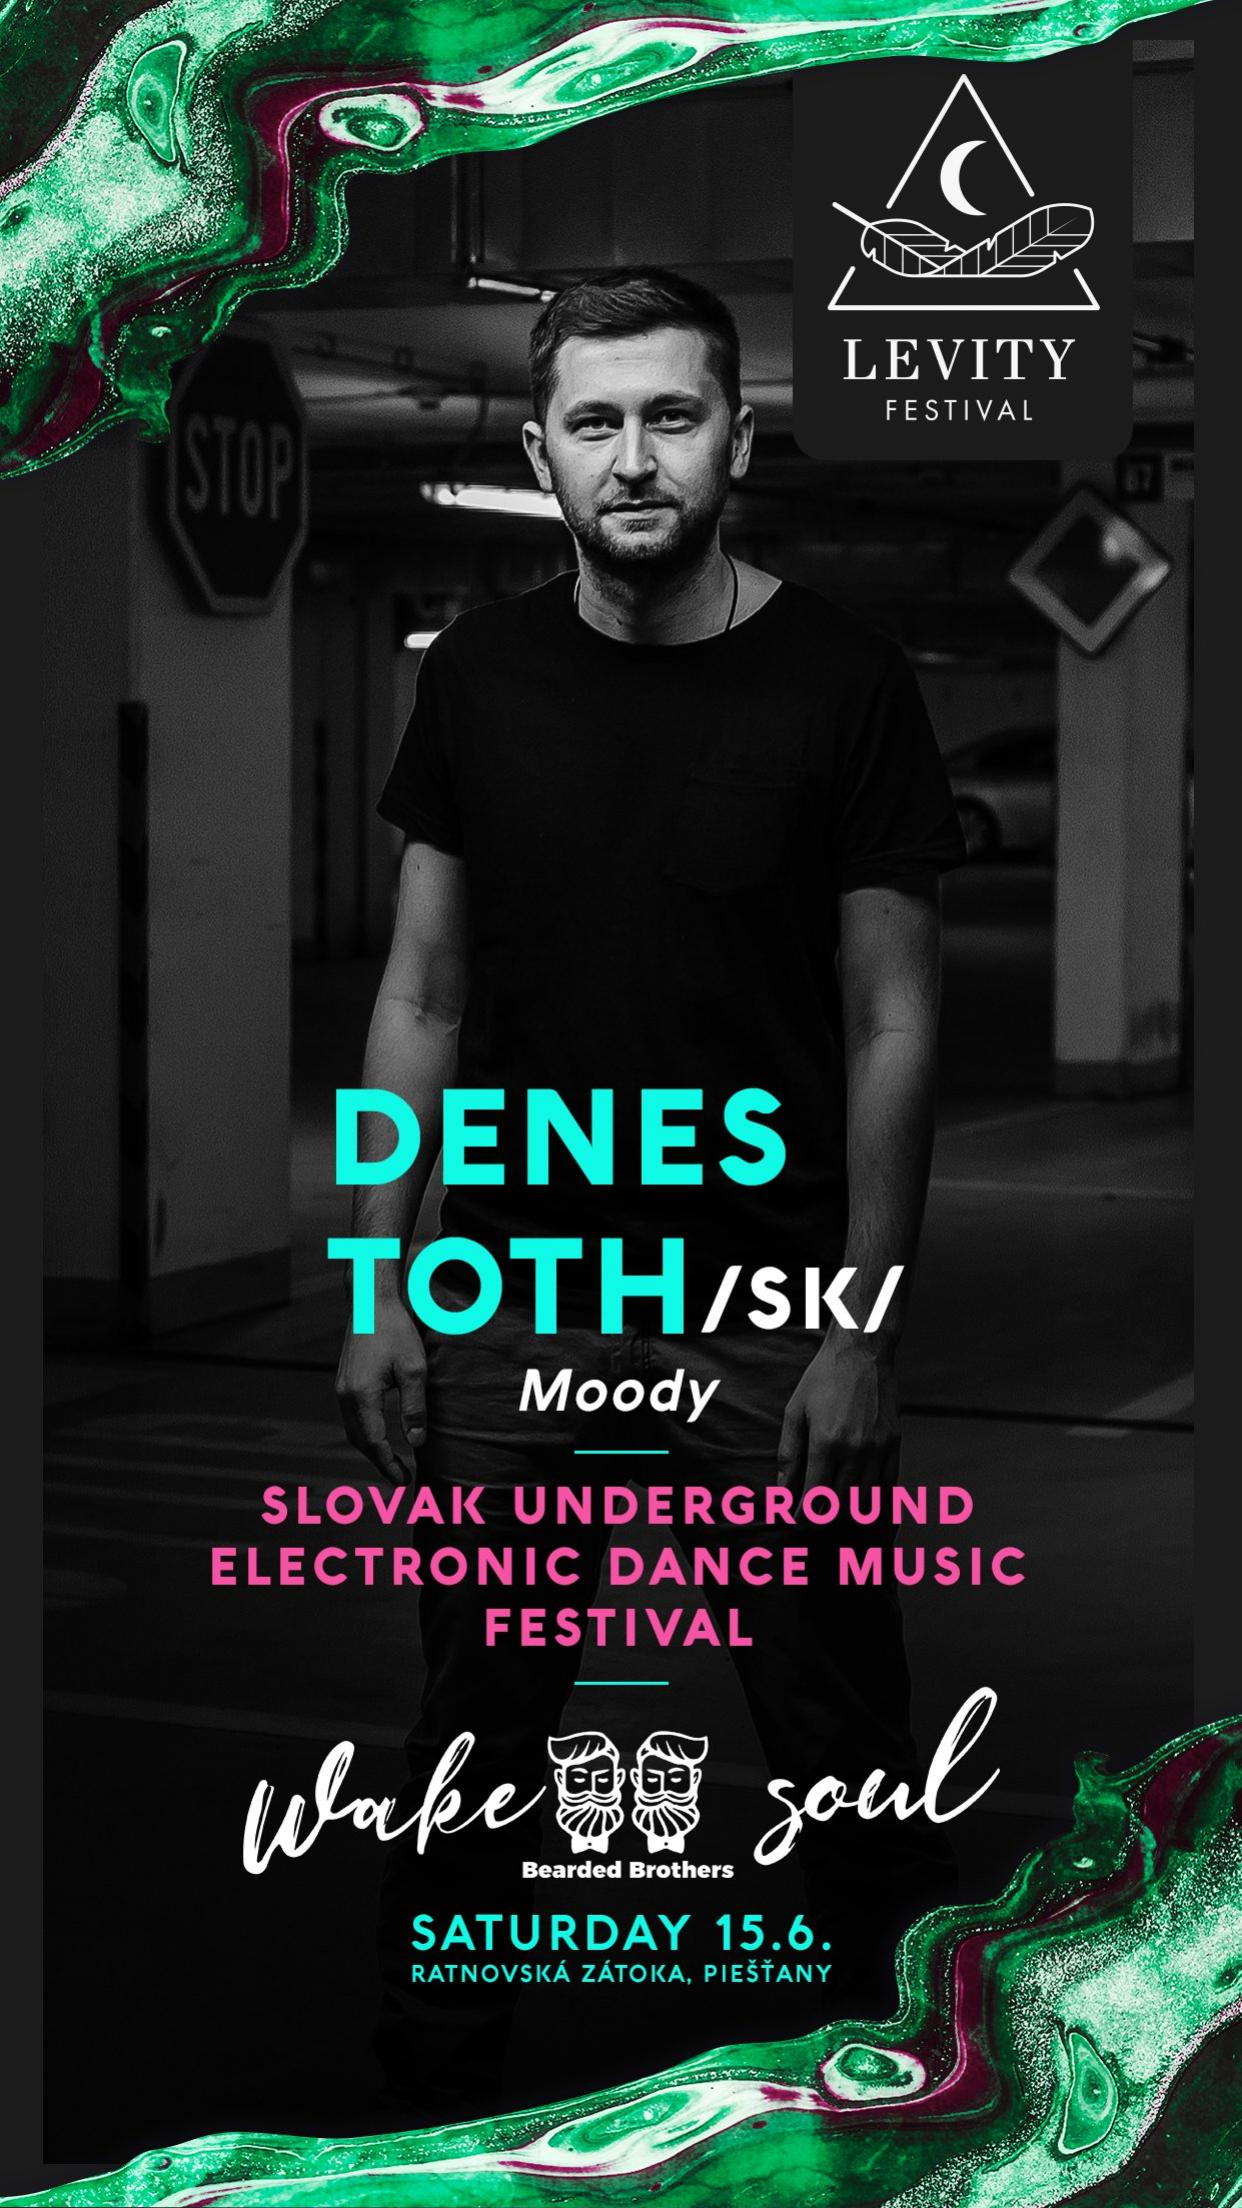 LEVITY Festival Piešťany undergroundová elektronická tanečná hudba zábava